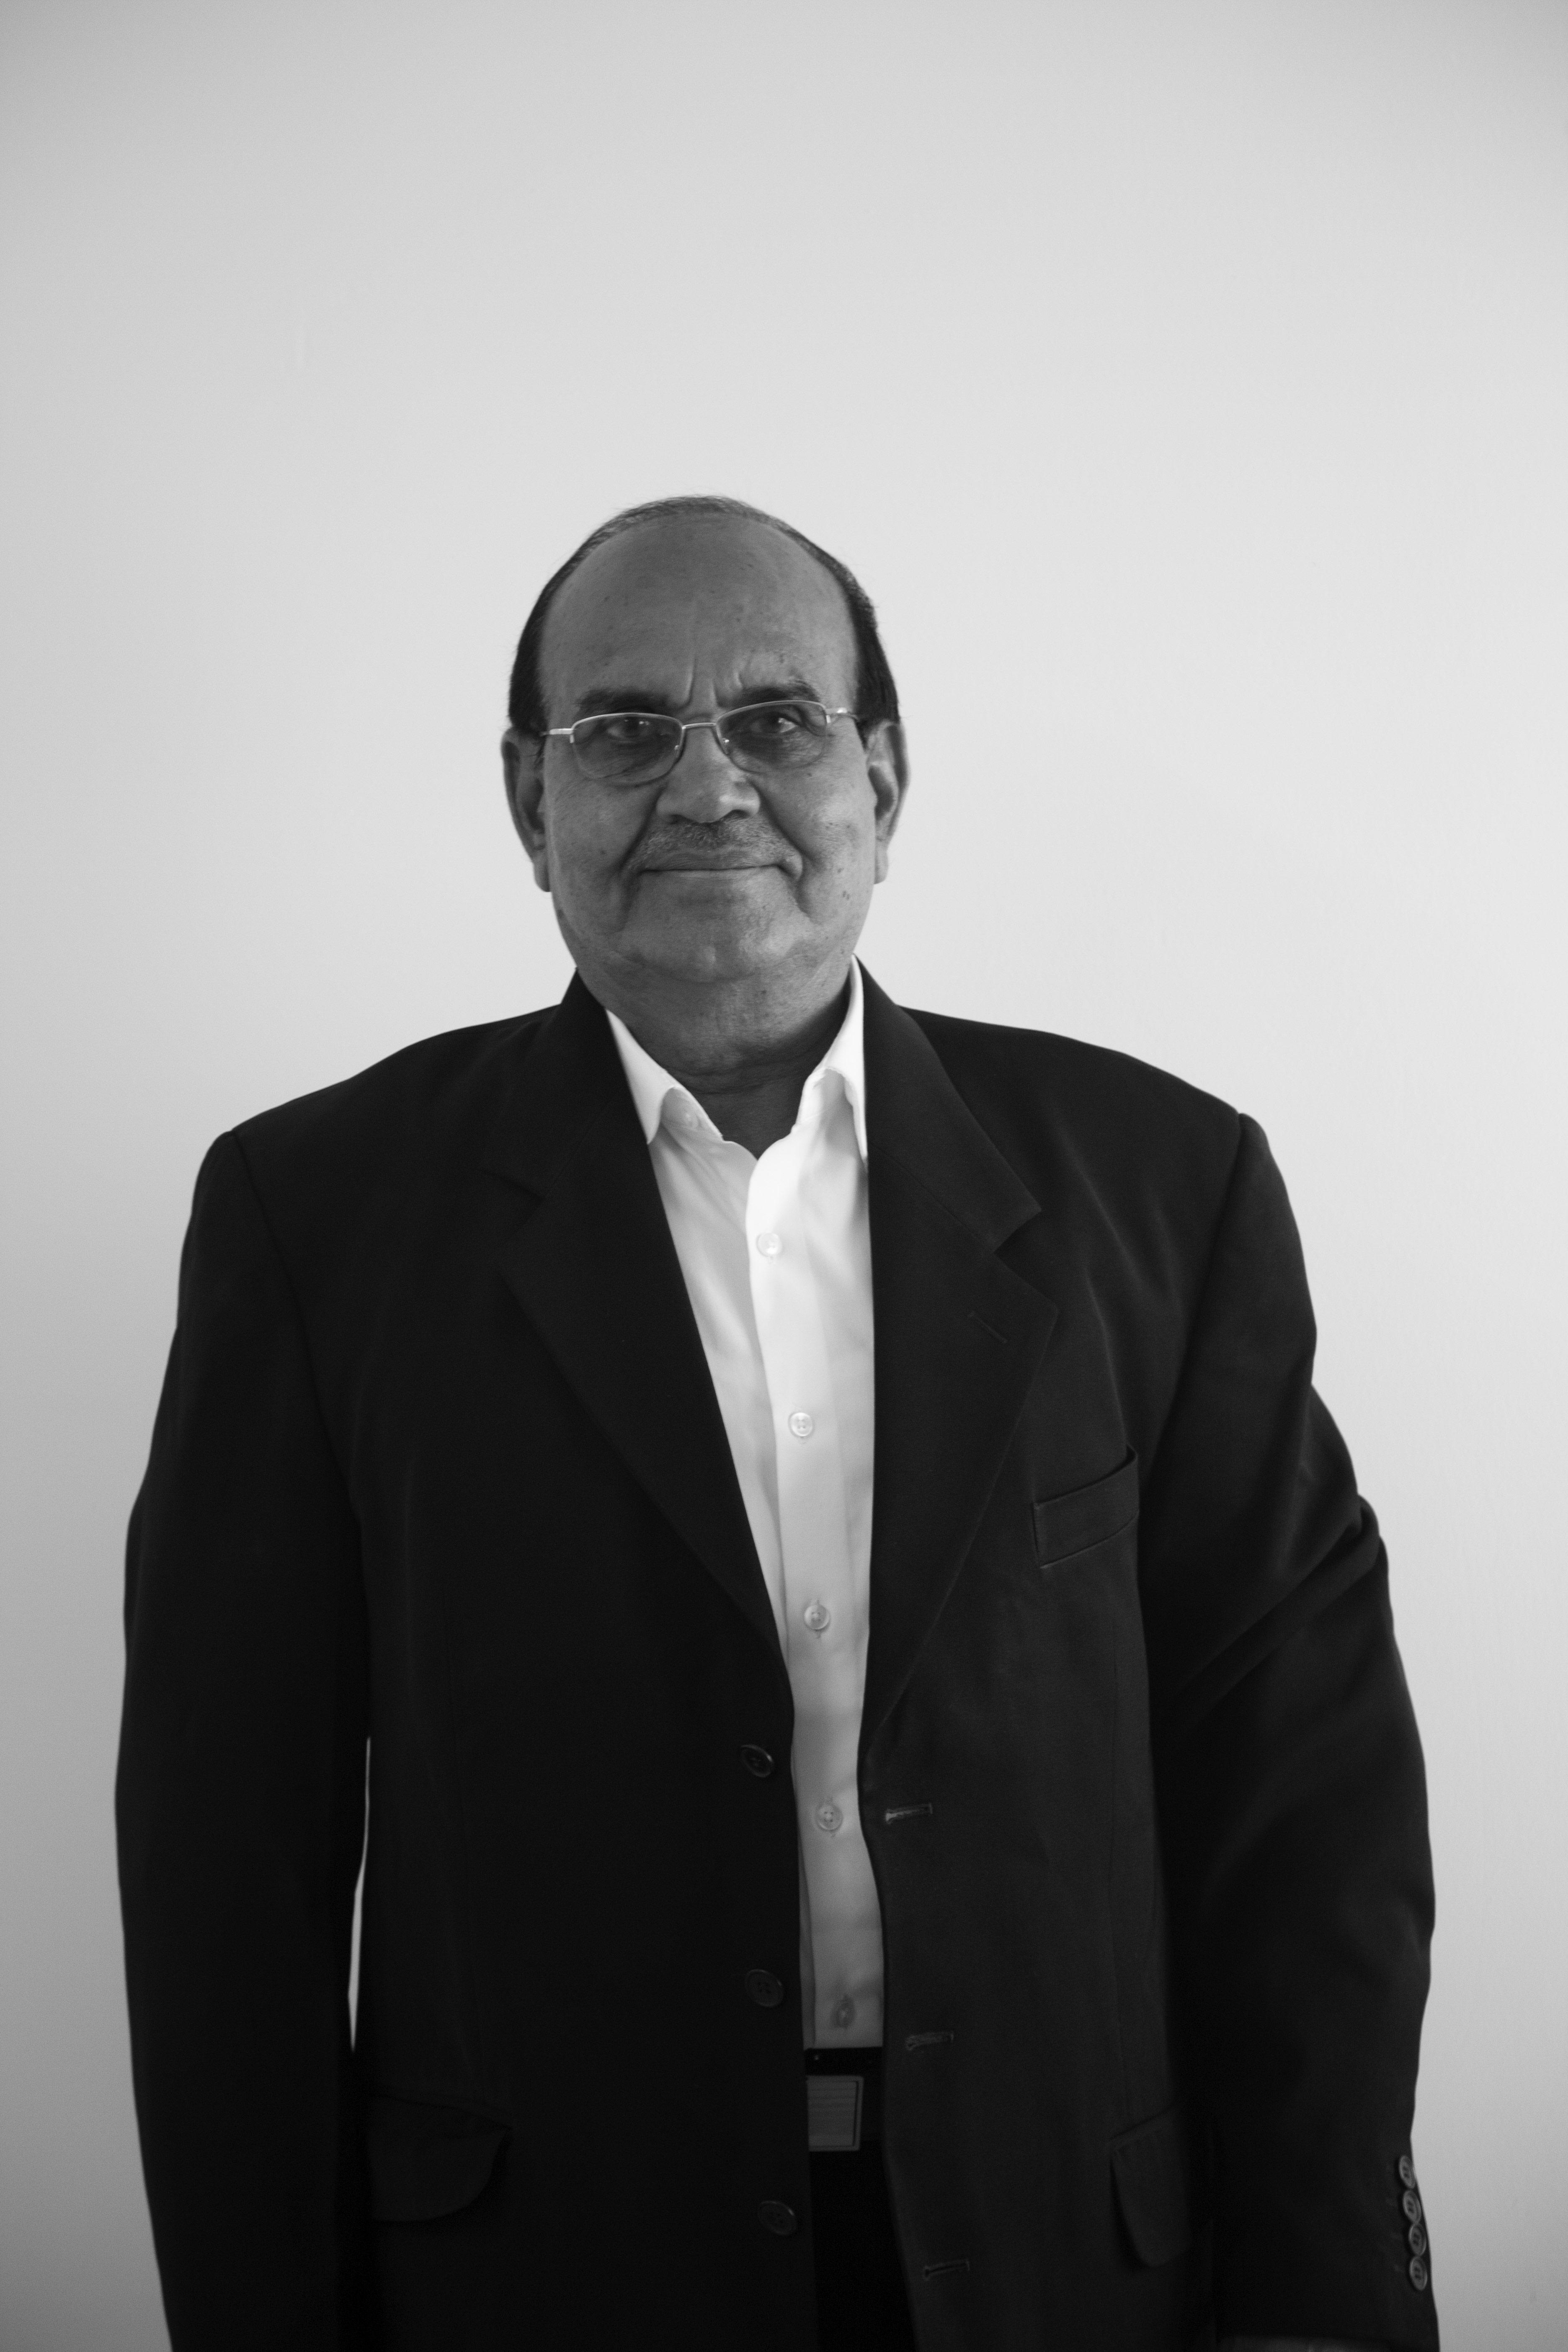 Palanisamy Eswaramoorthy